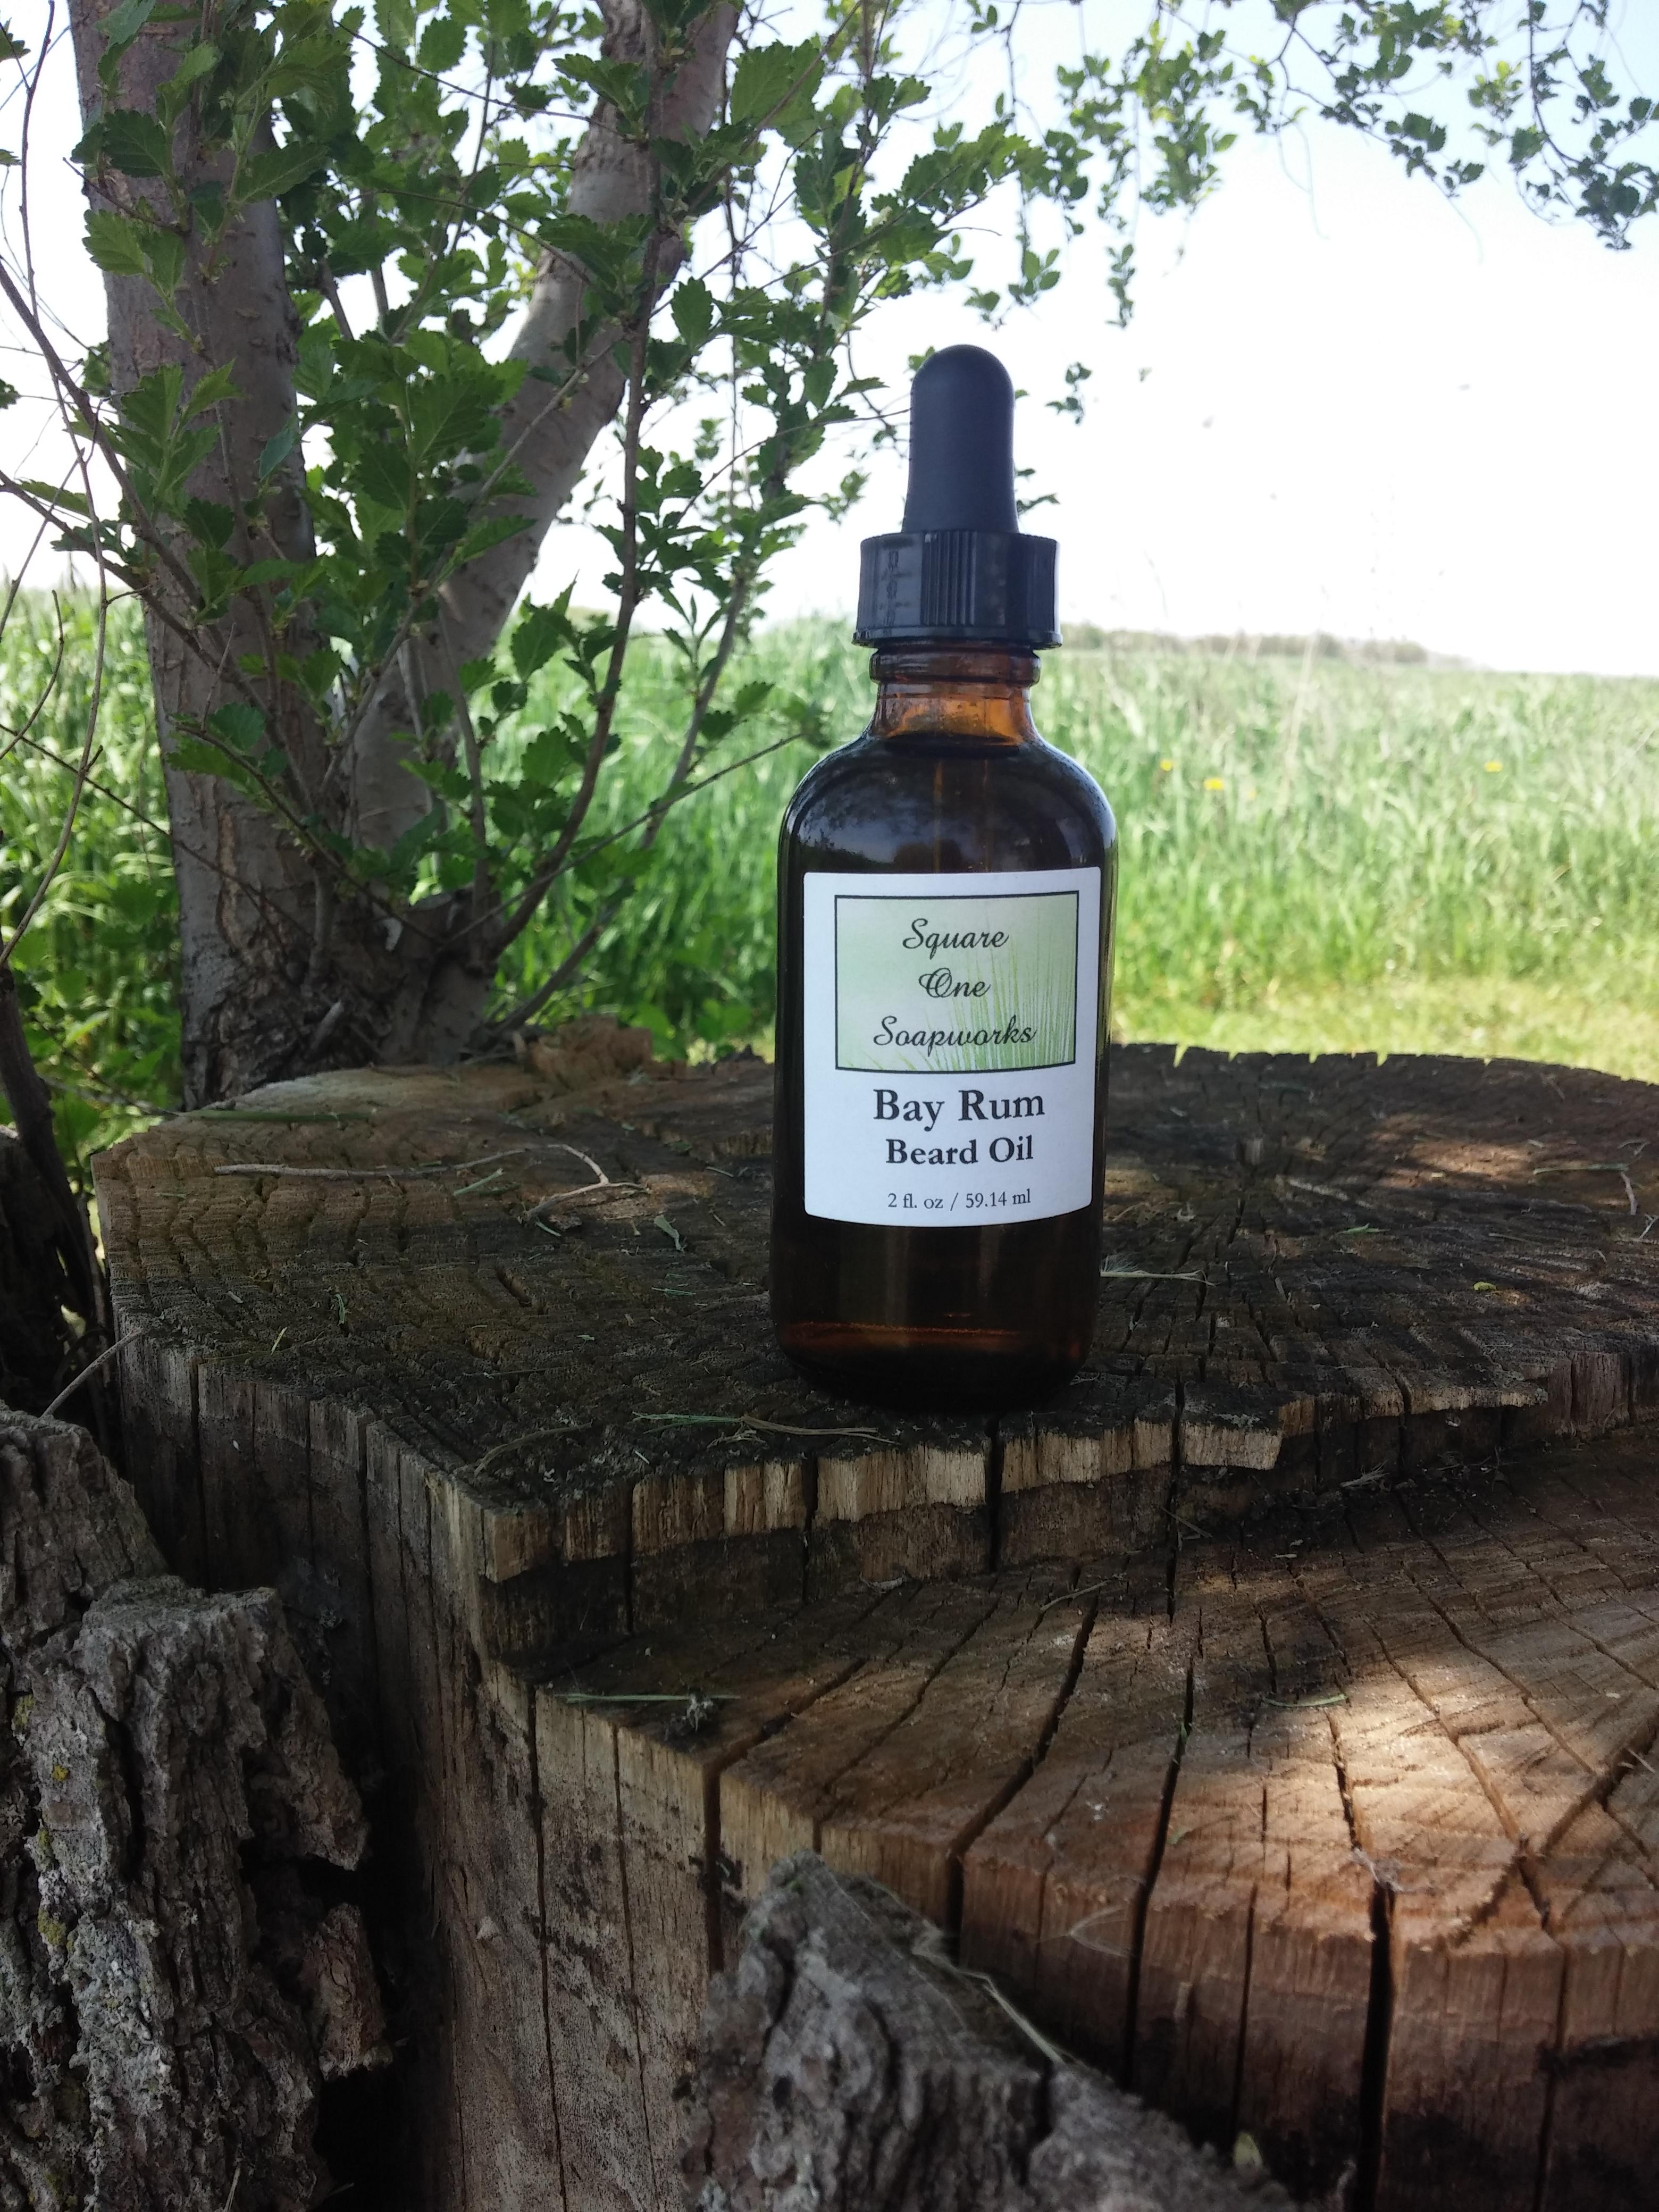 Bay Rum Beard Oil - Square One Soapworks